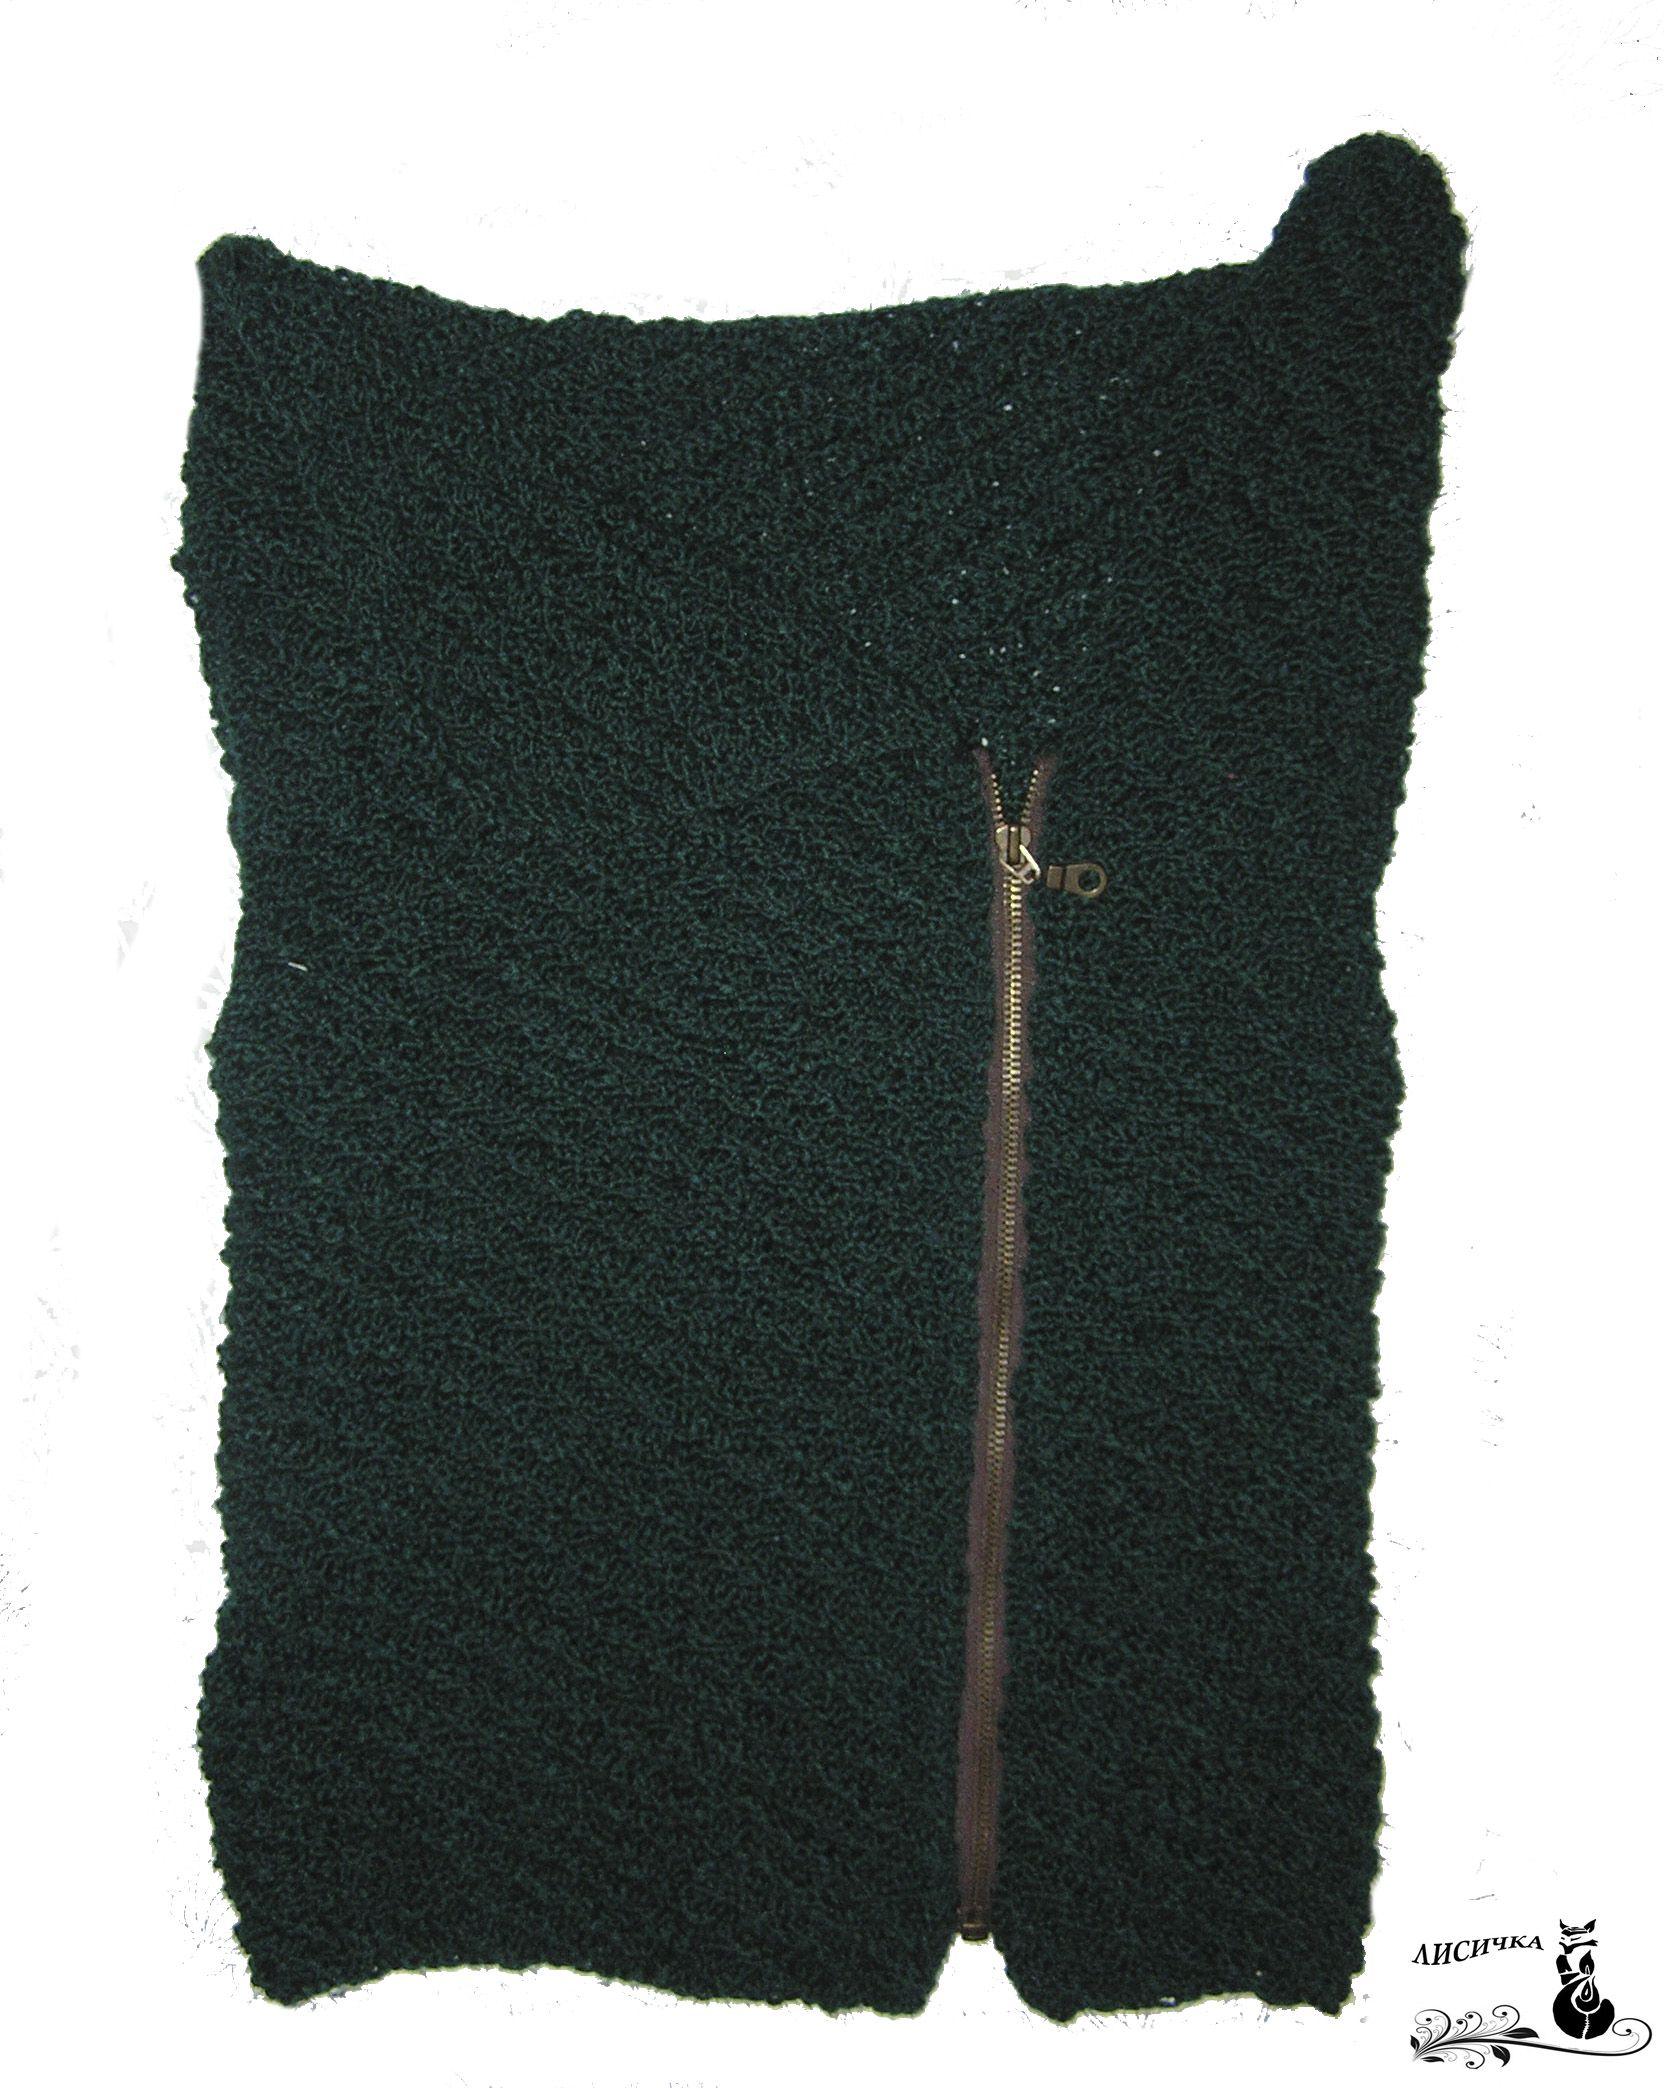 жилетженский вязаныйжилет вязанаяодежда жилет жилетка